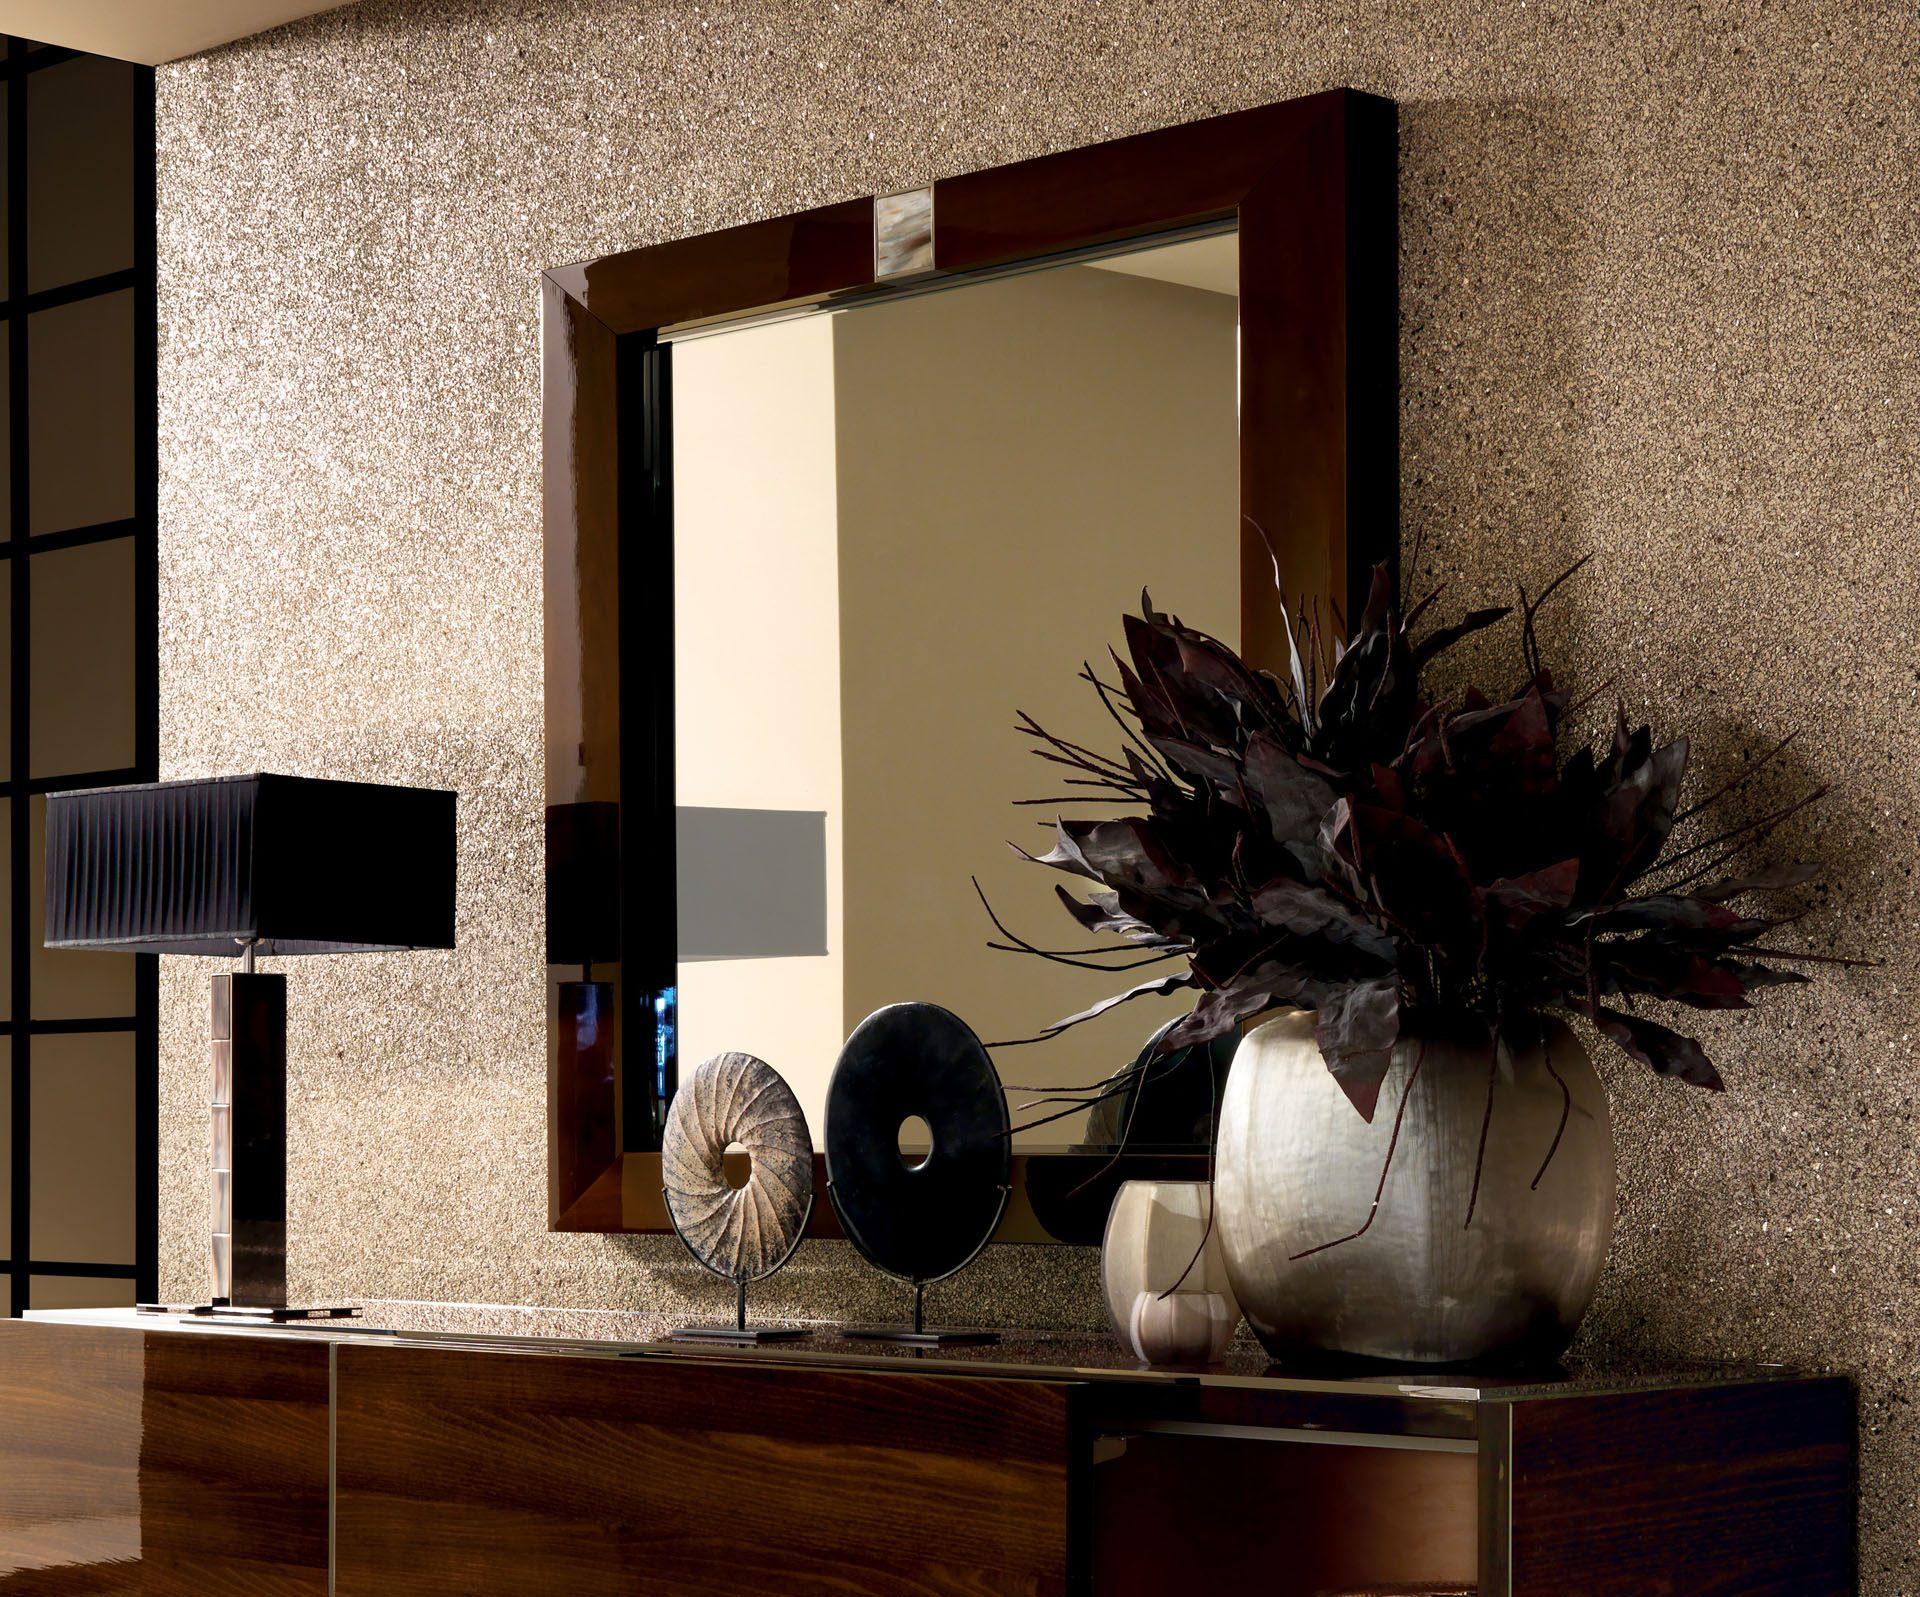 Dresscode Wall Mirror